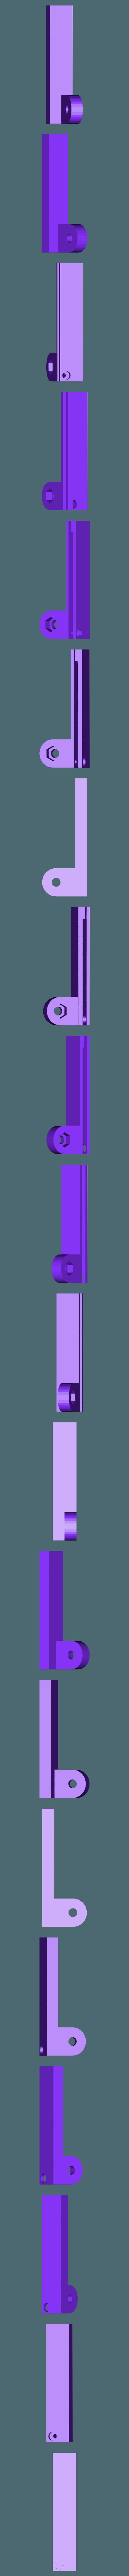 LeftBottom.stl Download free STL file Arduino Uno Slider w/ 2x16 LCD • Design to 3D print, NHiggs